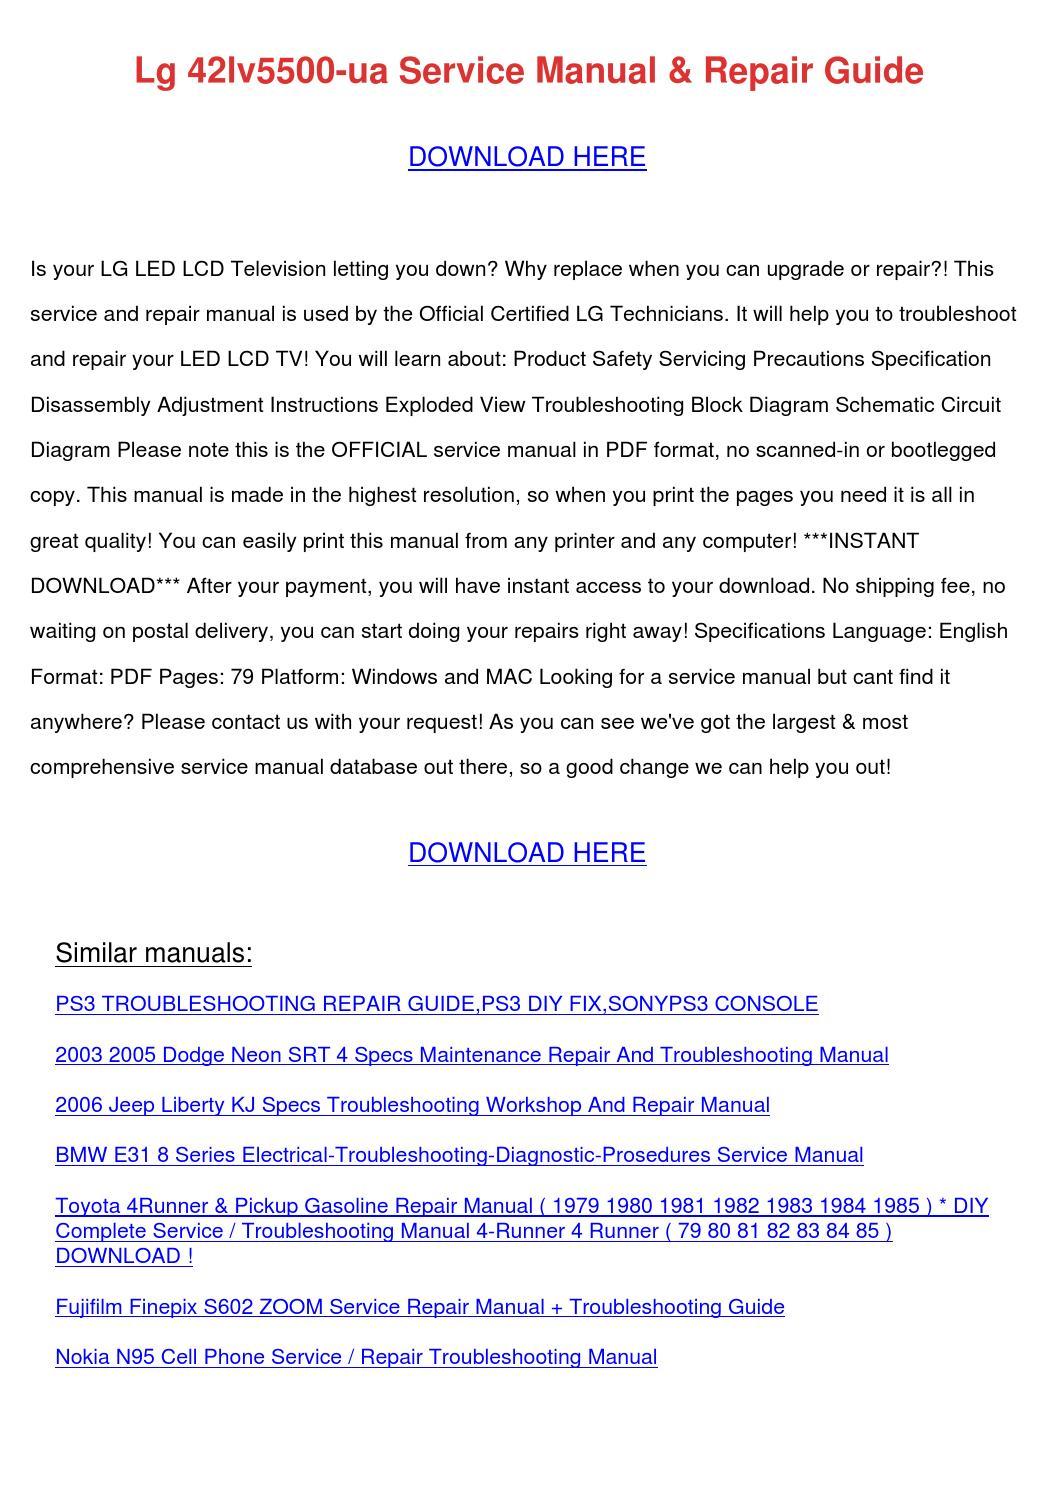 Lg 42lv5500 Ua Service Manual Repair Guide by ManuelMartell - issuu